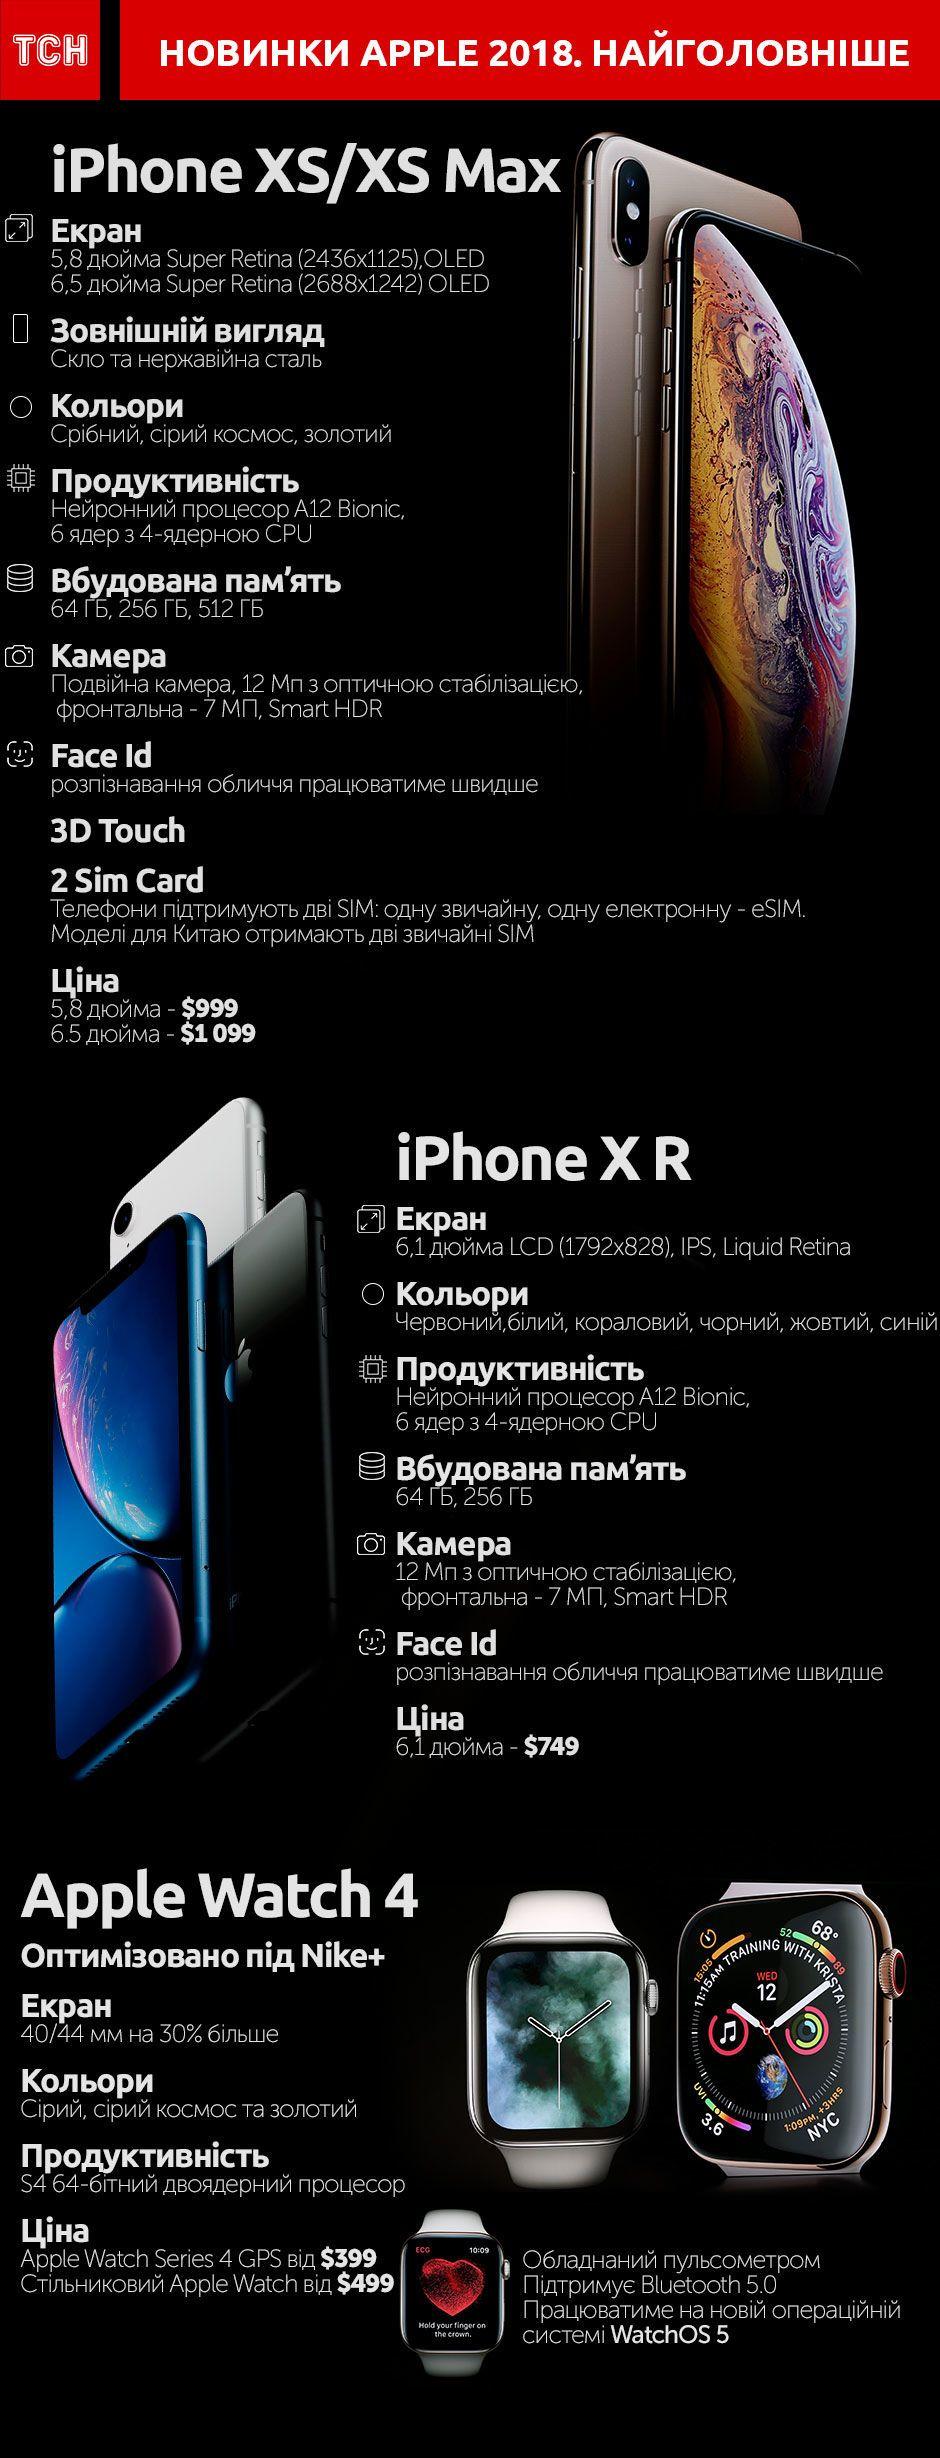 все, що представила Apple у 2018